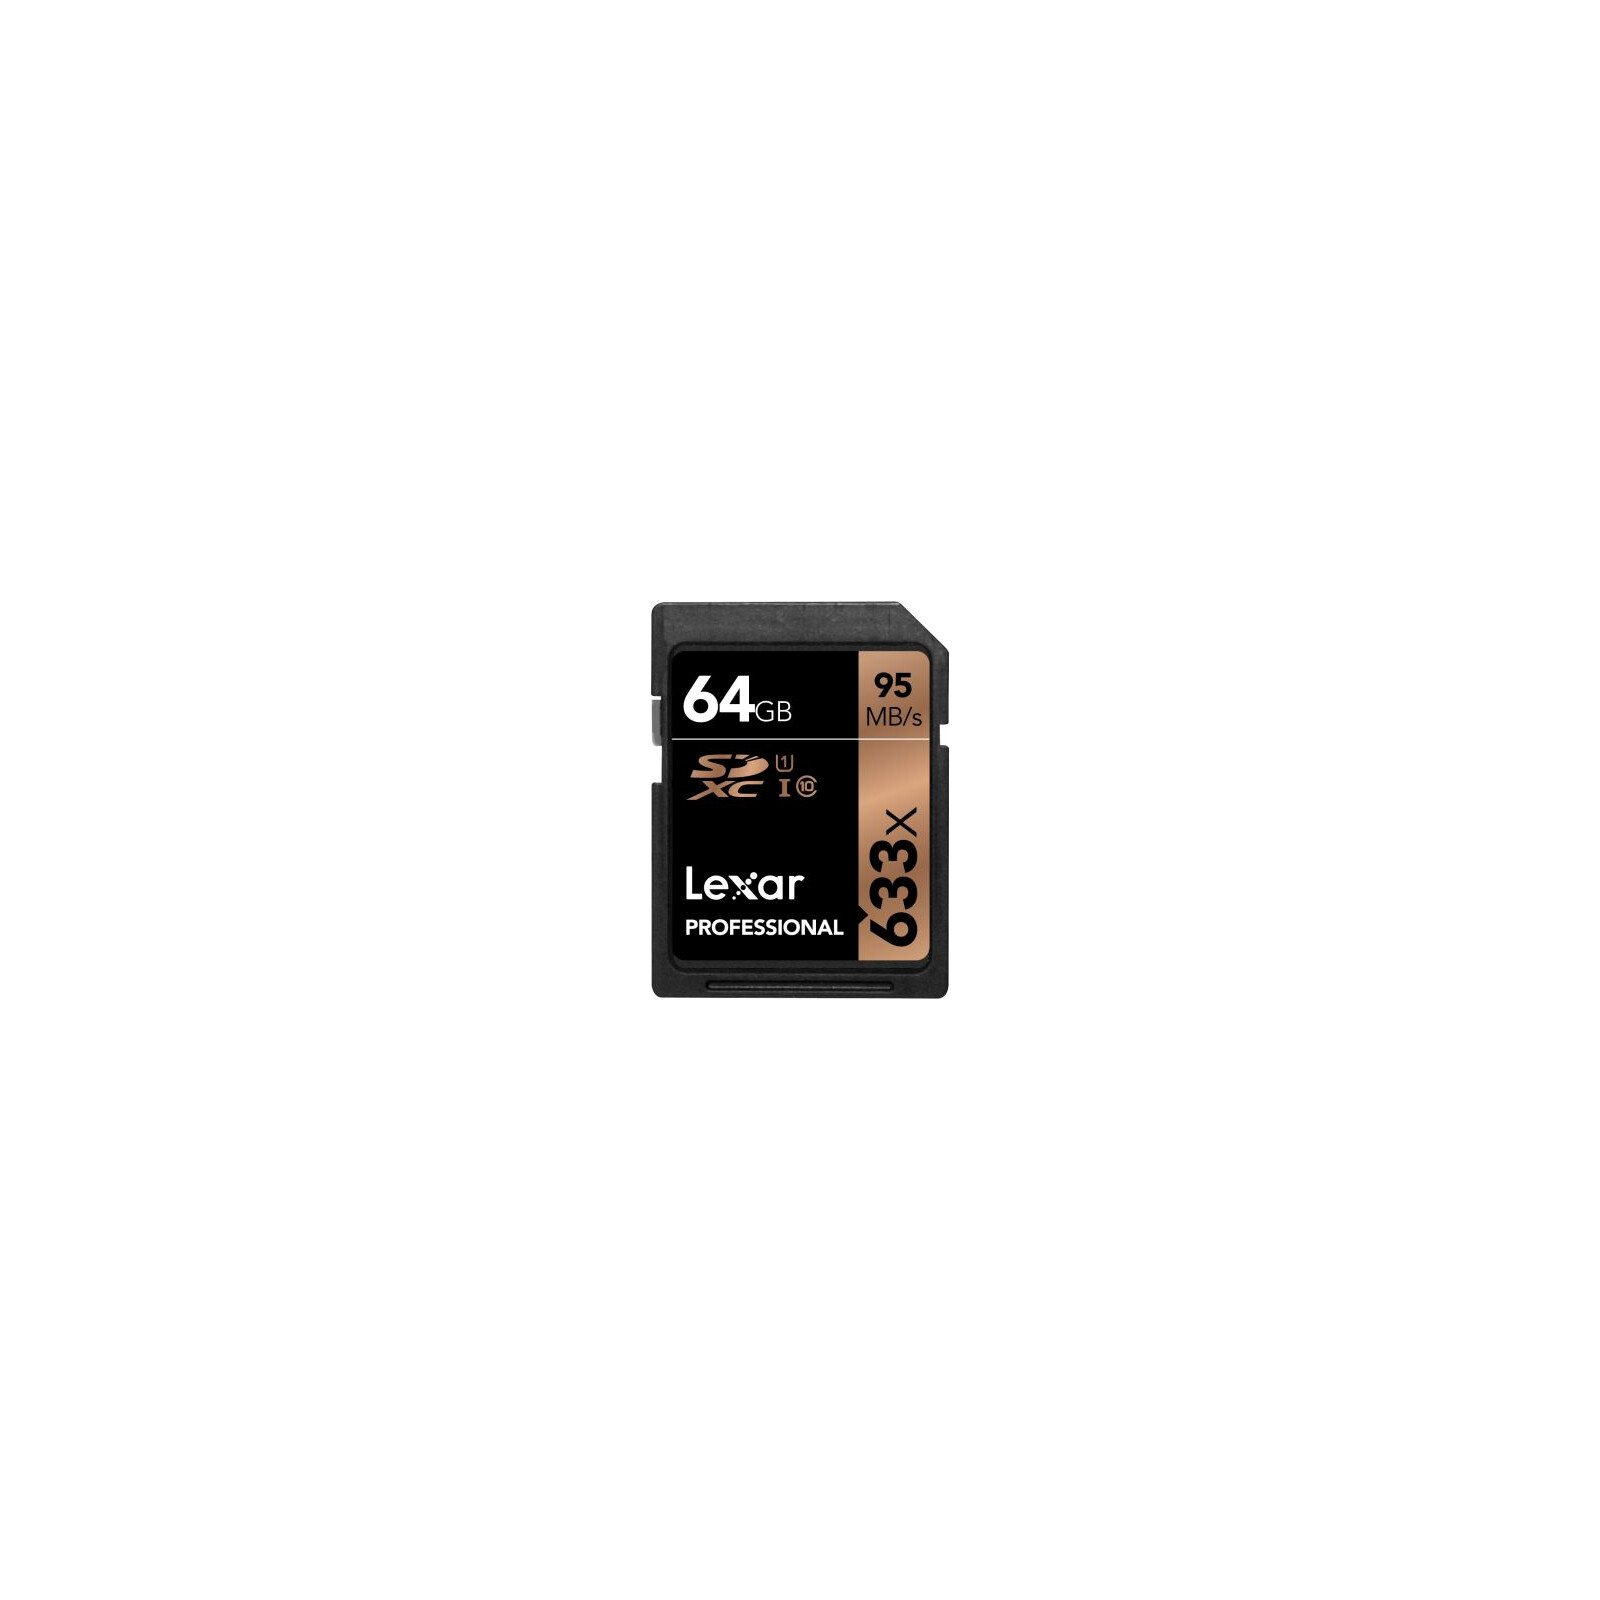 Lexar SDXC 64GB Professional UHS 1 95Mb/s